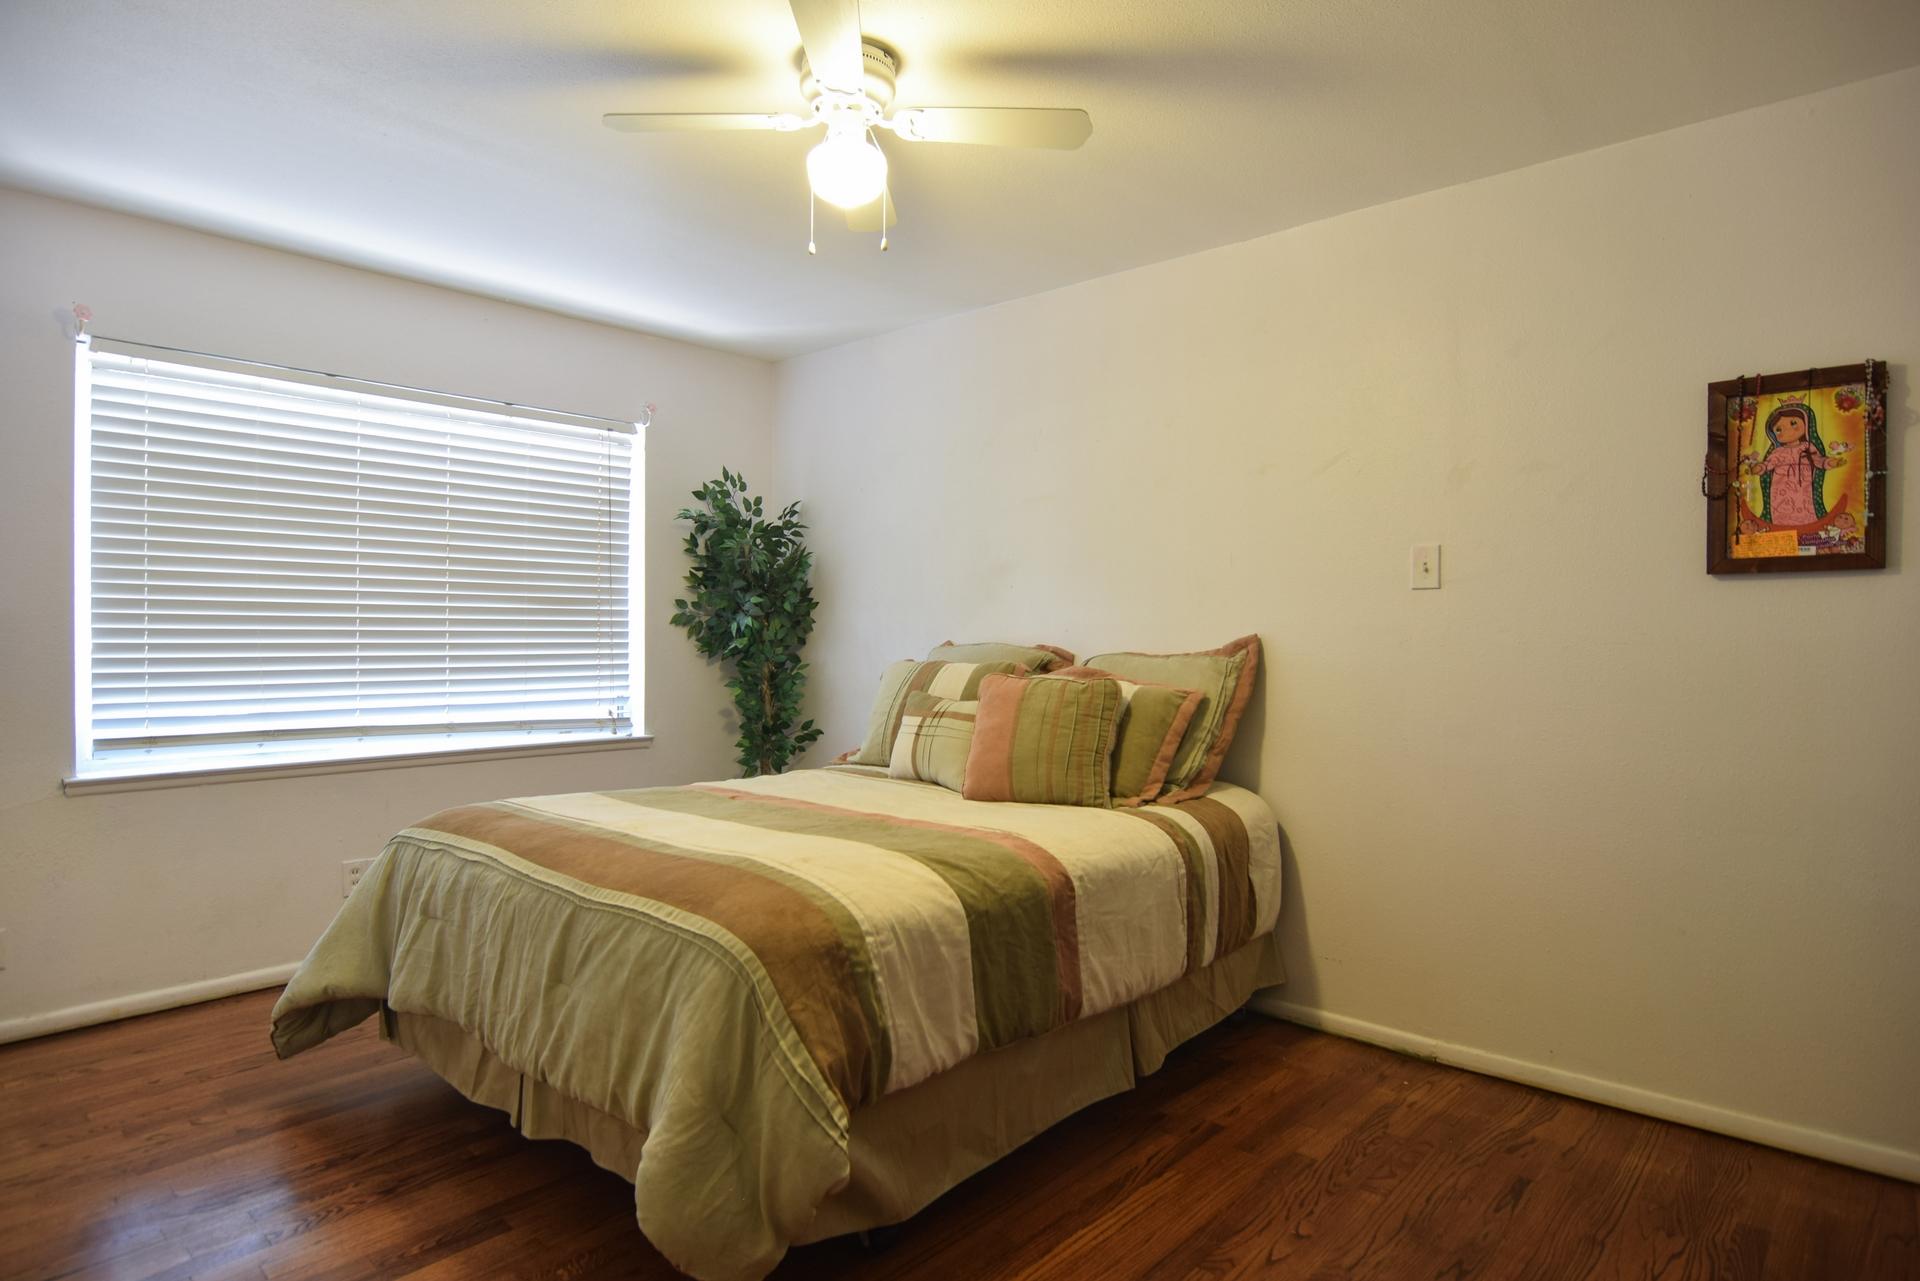 Bed2 3112 Catamore Dr Dallas TX 75229.jpg